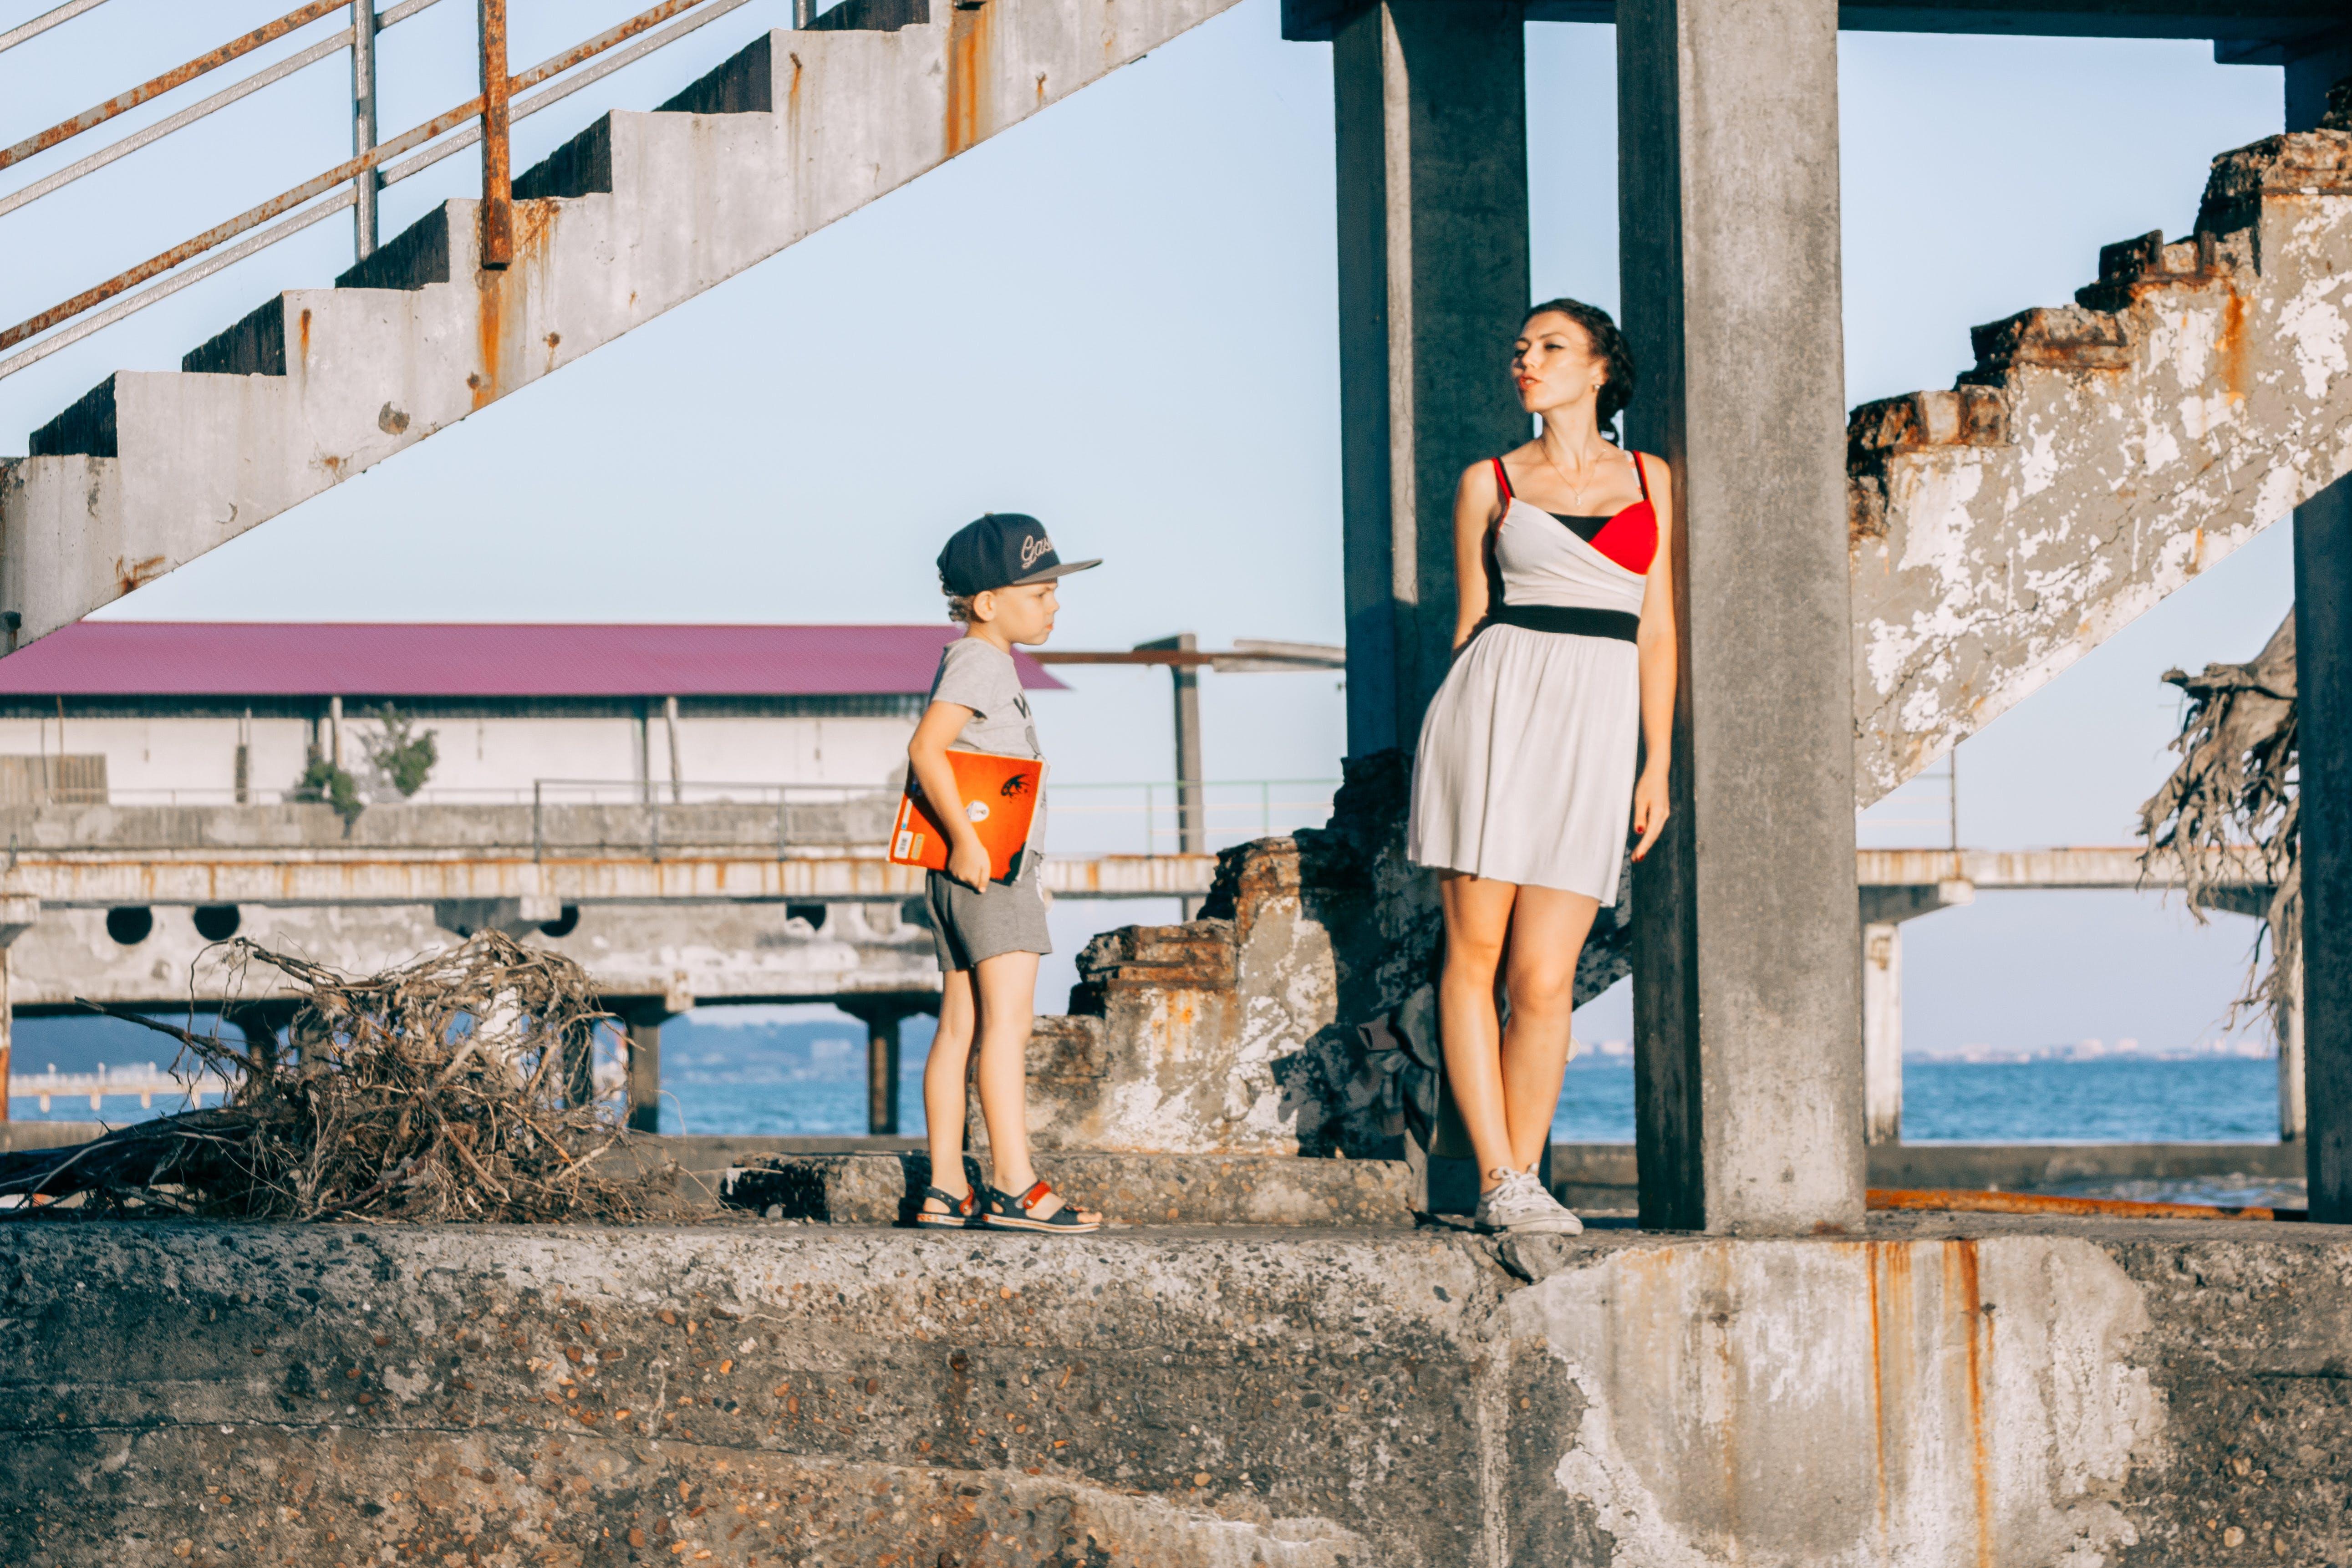 Woman Beside Girl Under Concrete Bridge